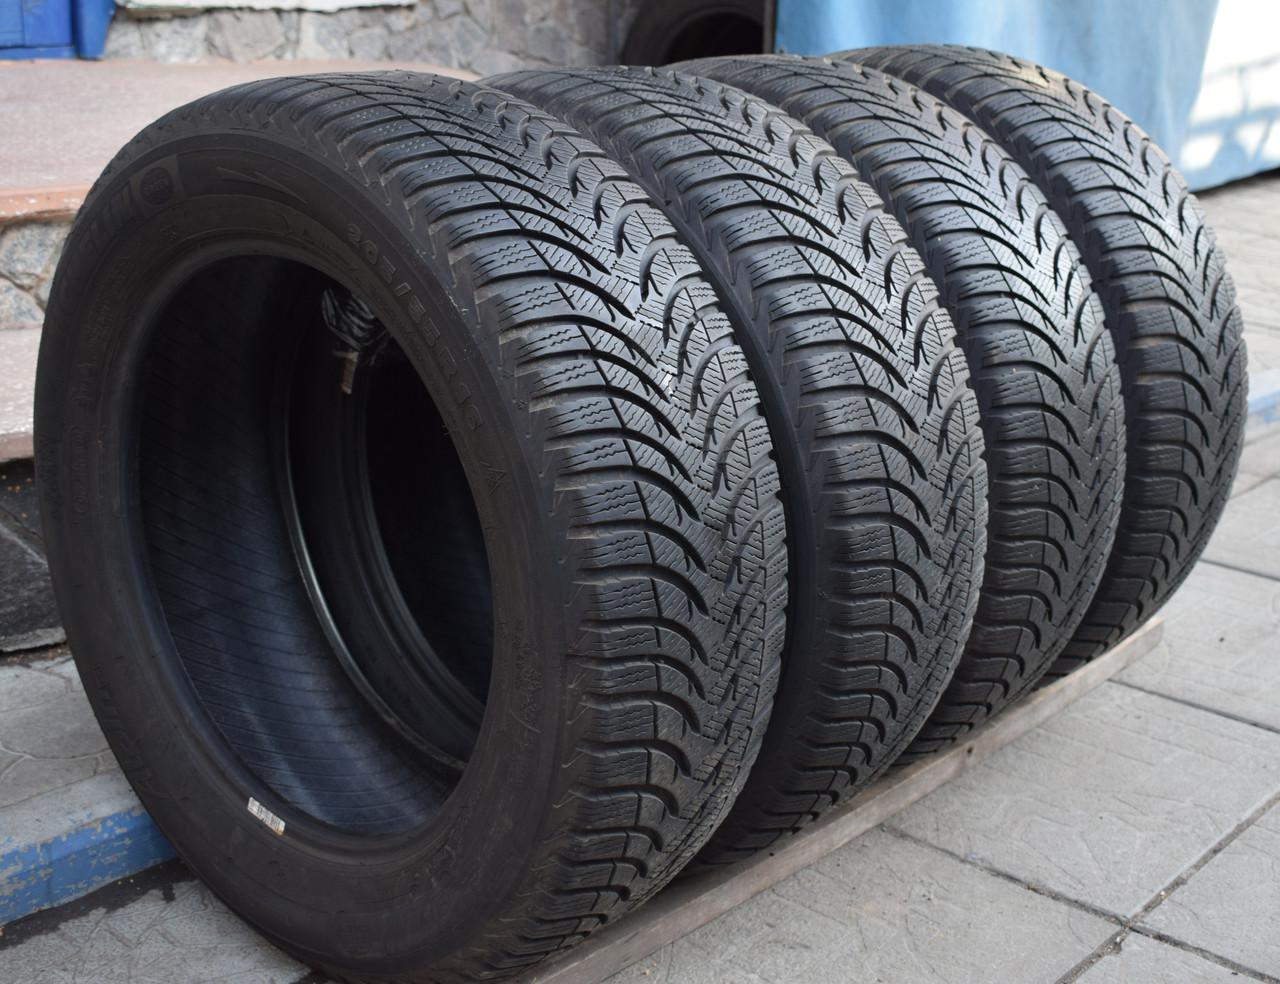 Шины б/у 205/55 R16 Michelin Alpin A4, ЗИМА, 6 мм, комплект